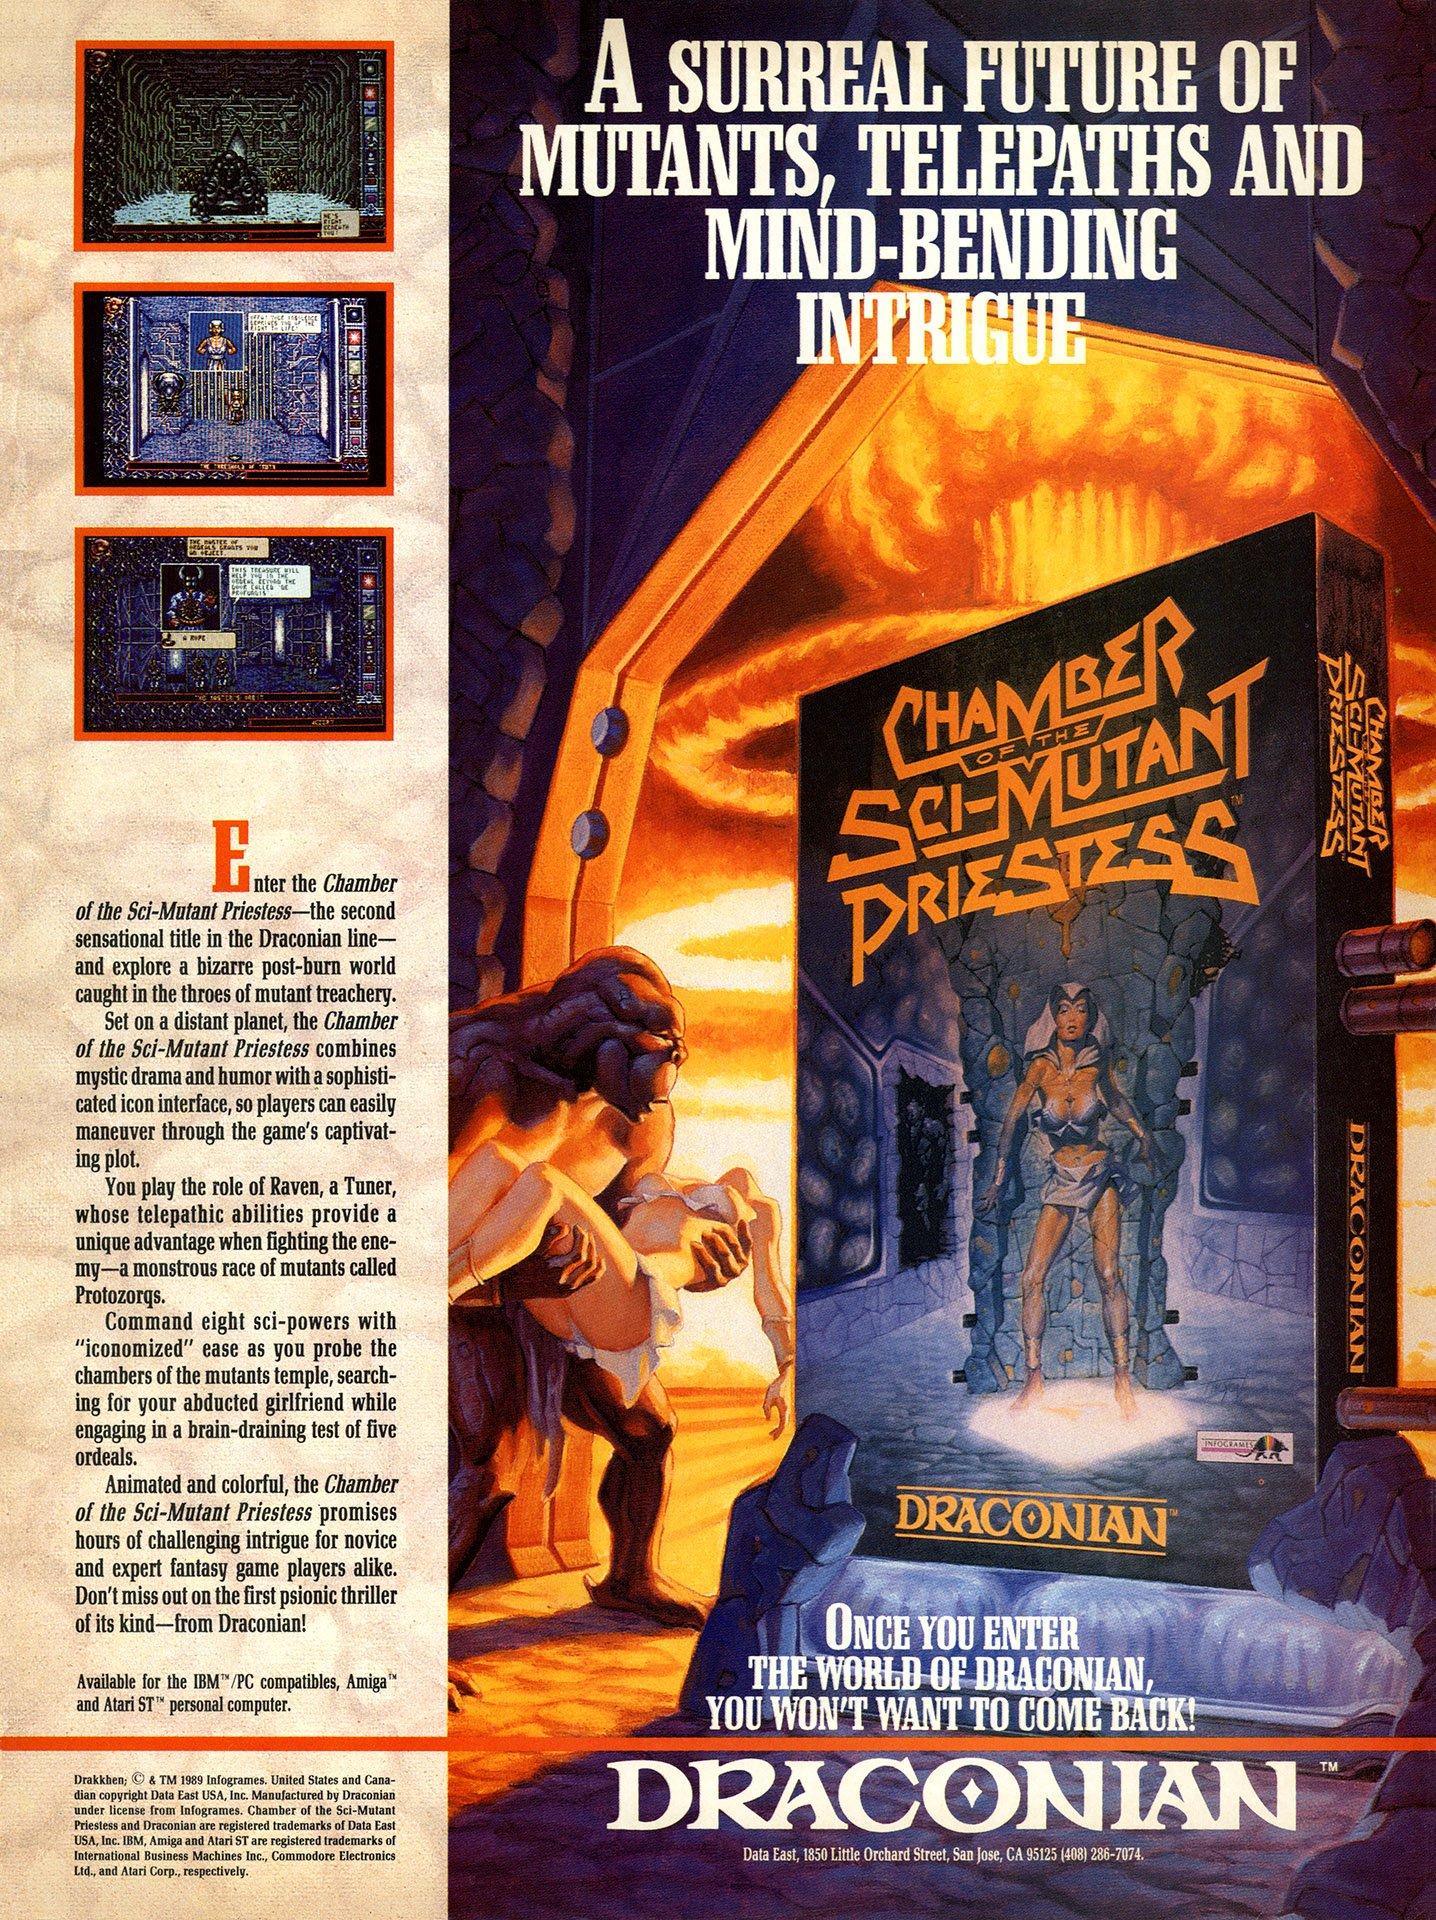 Chamber of the Sci-Fi Mutant Priestess